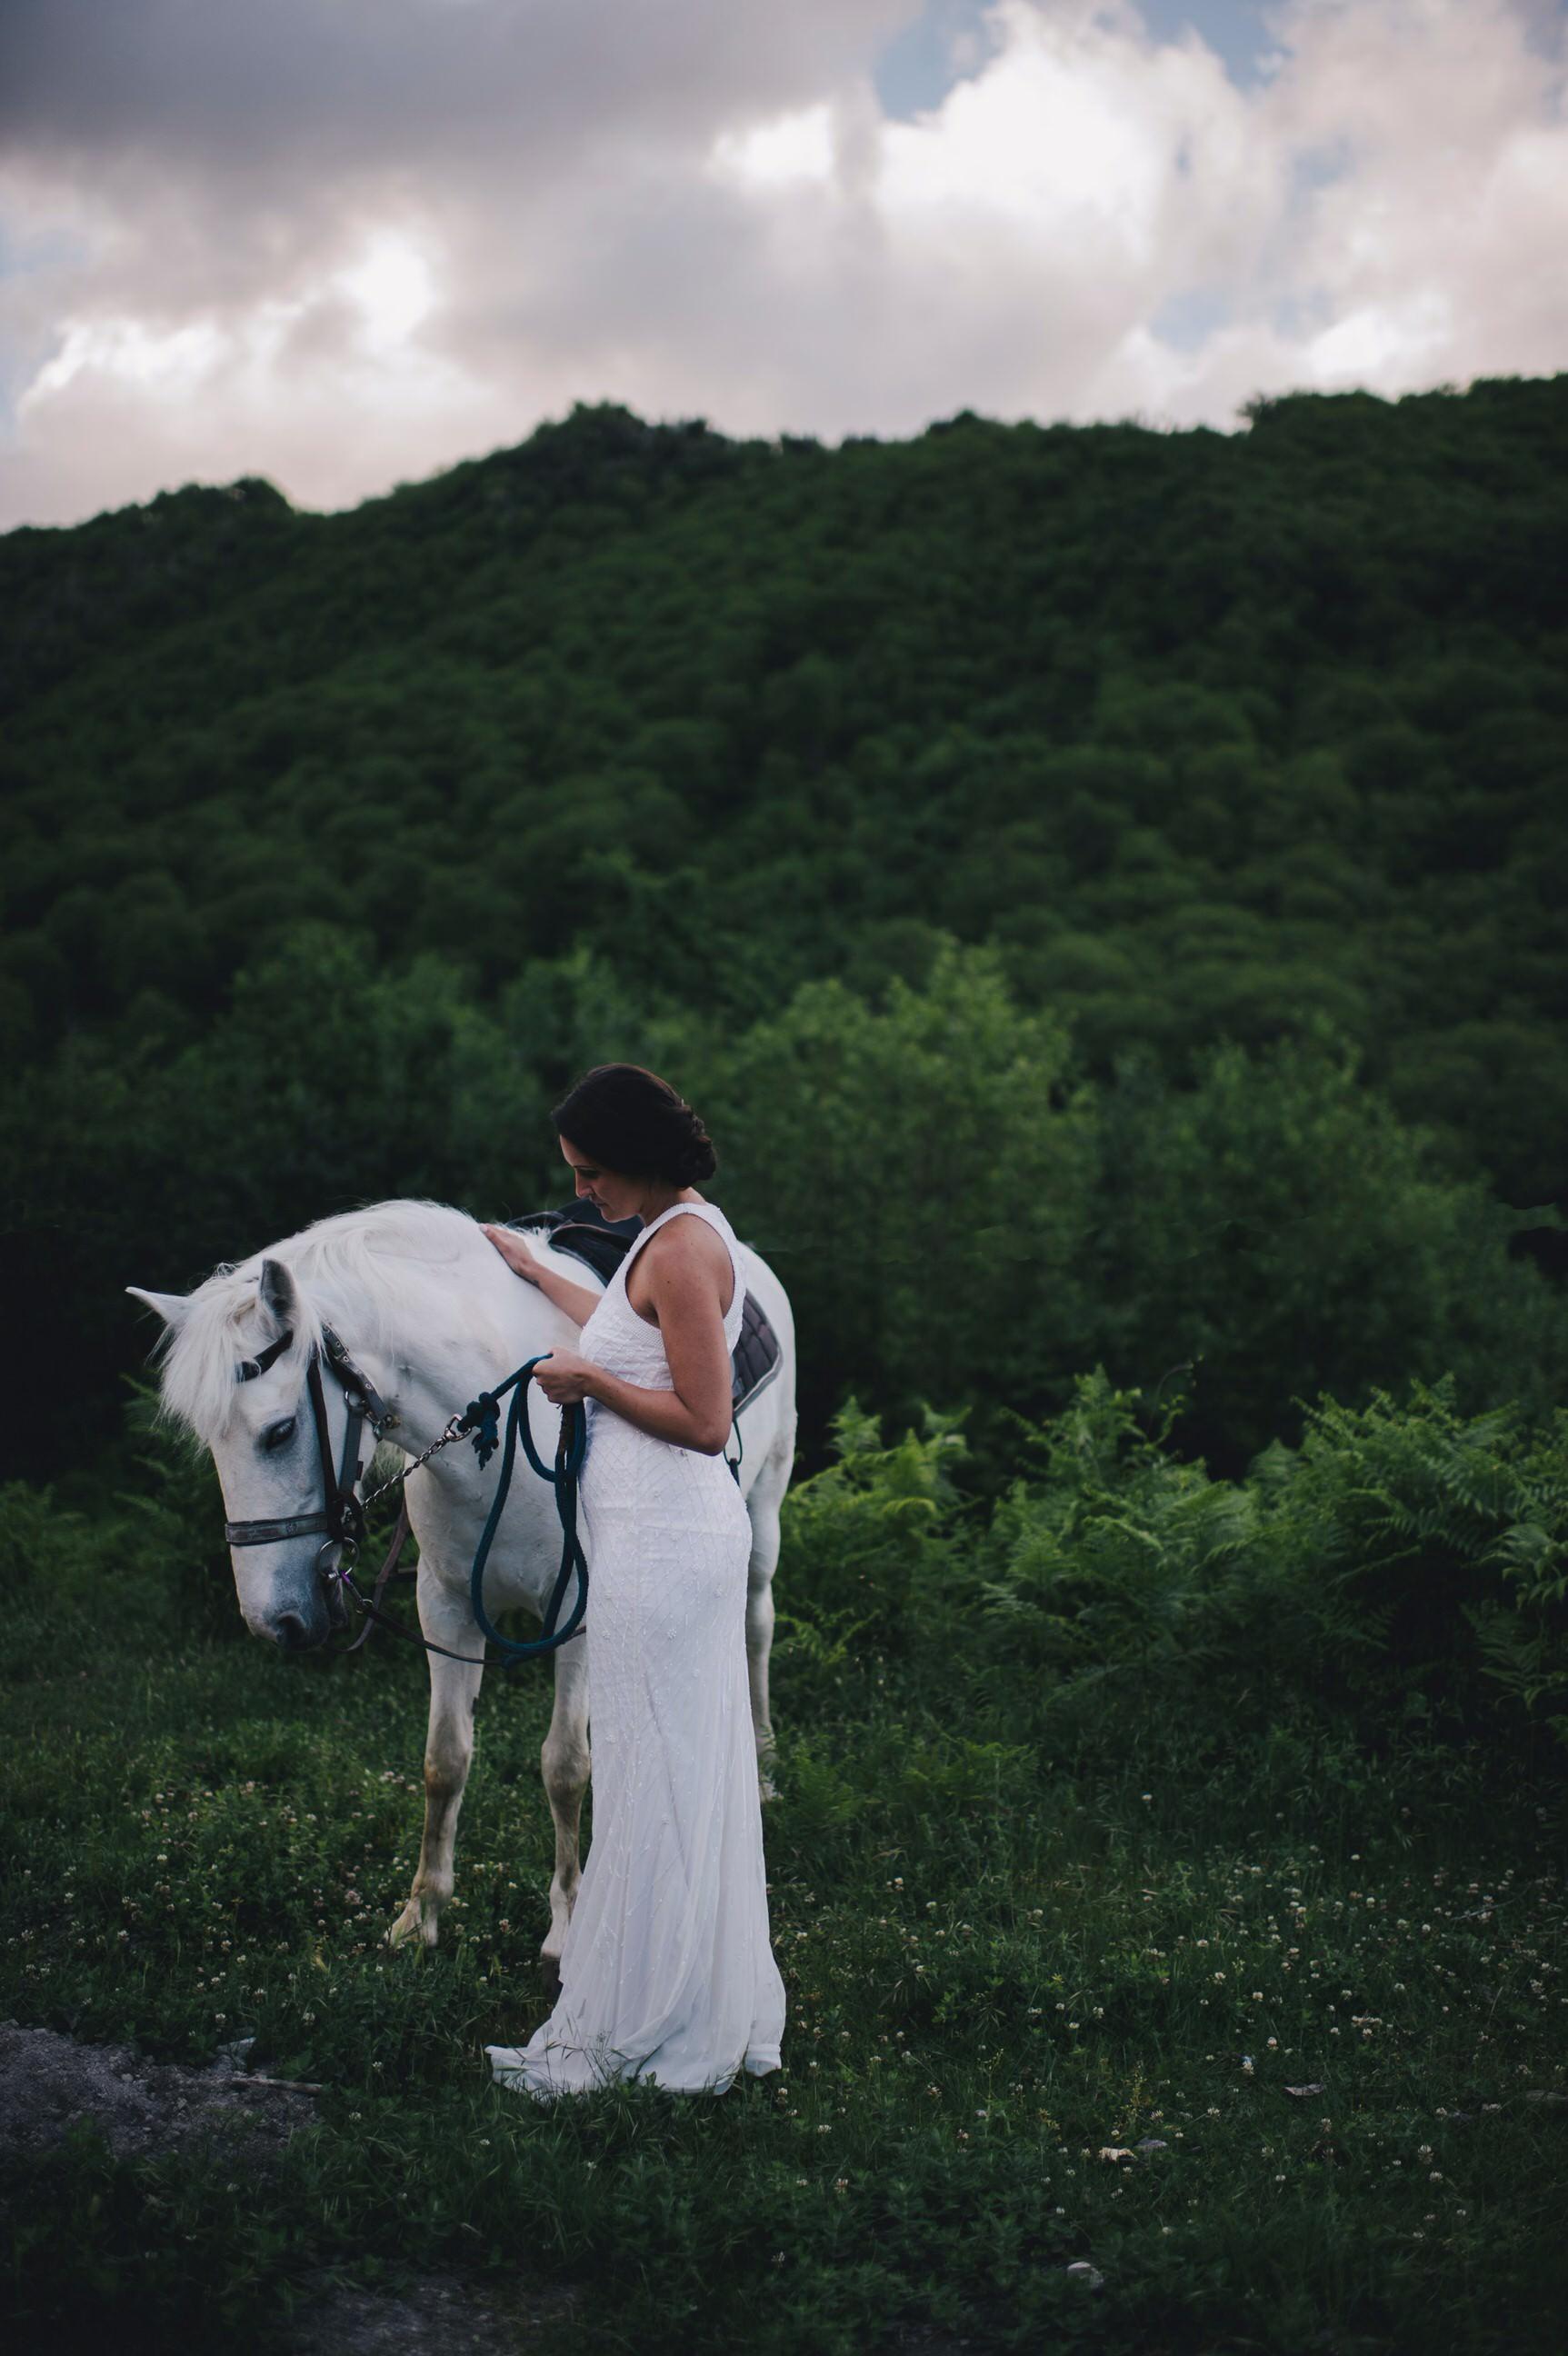 gianni di natale bride with a white horse